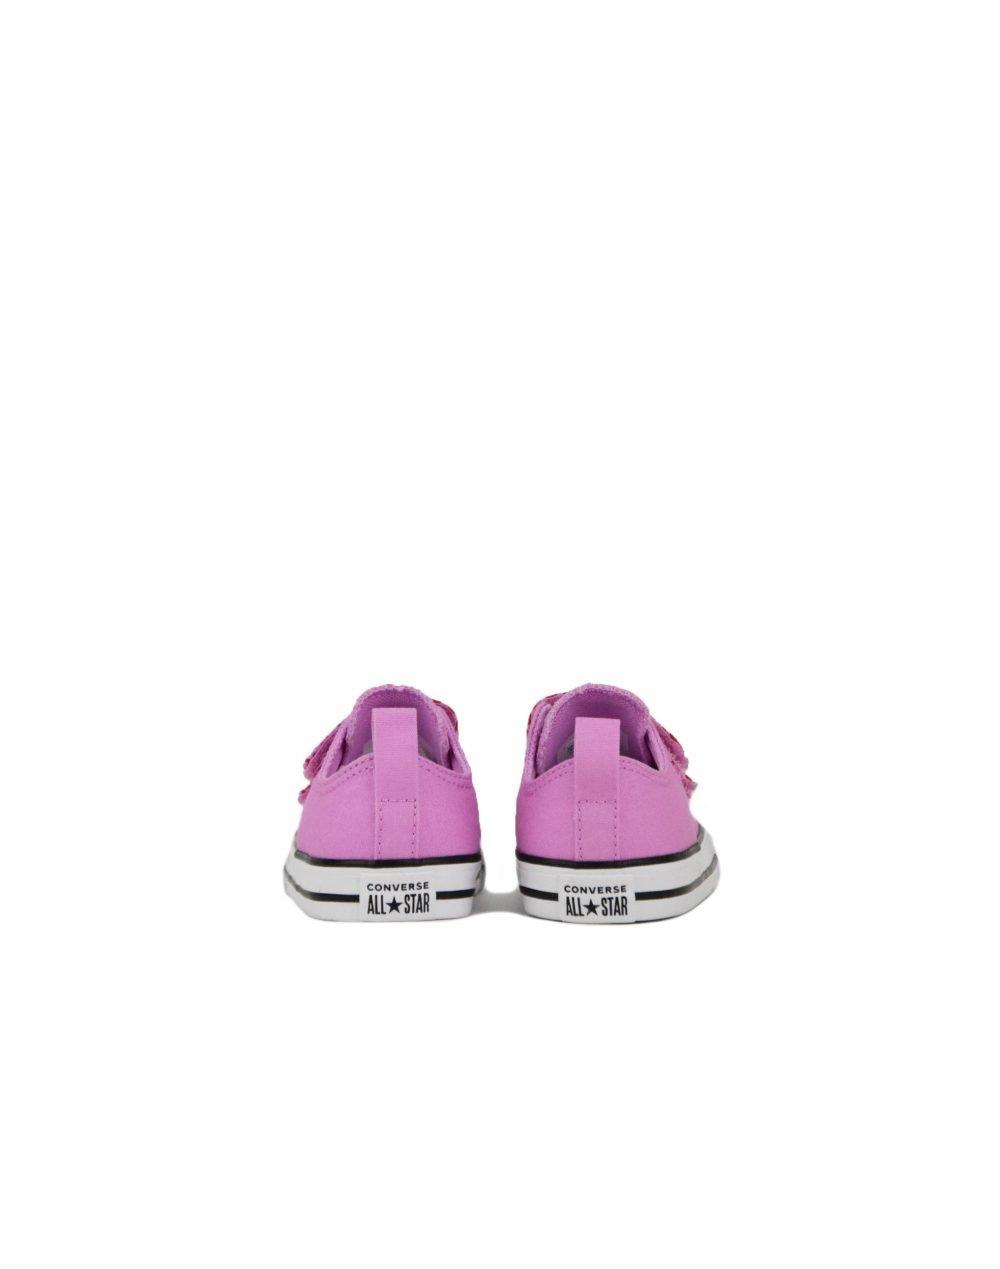 Converse Chuck Taylor All Star 2V (767194) Peony Pink